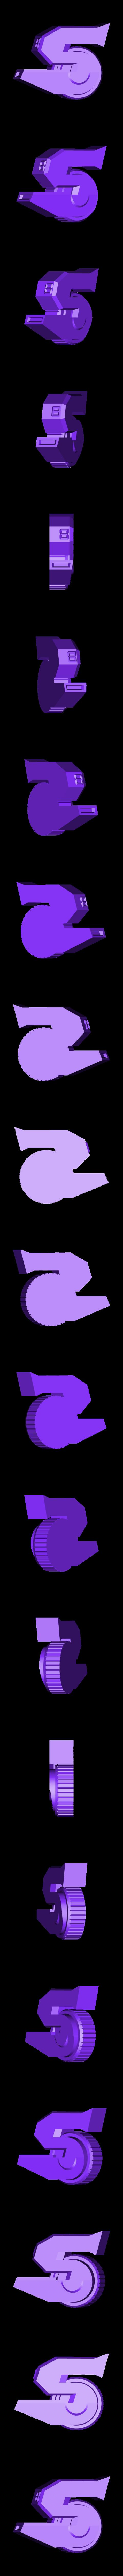 simon_S8.stl Download free STL file Simon, the mozzle • 3D print model, mageli